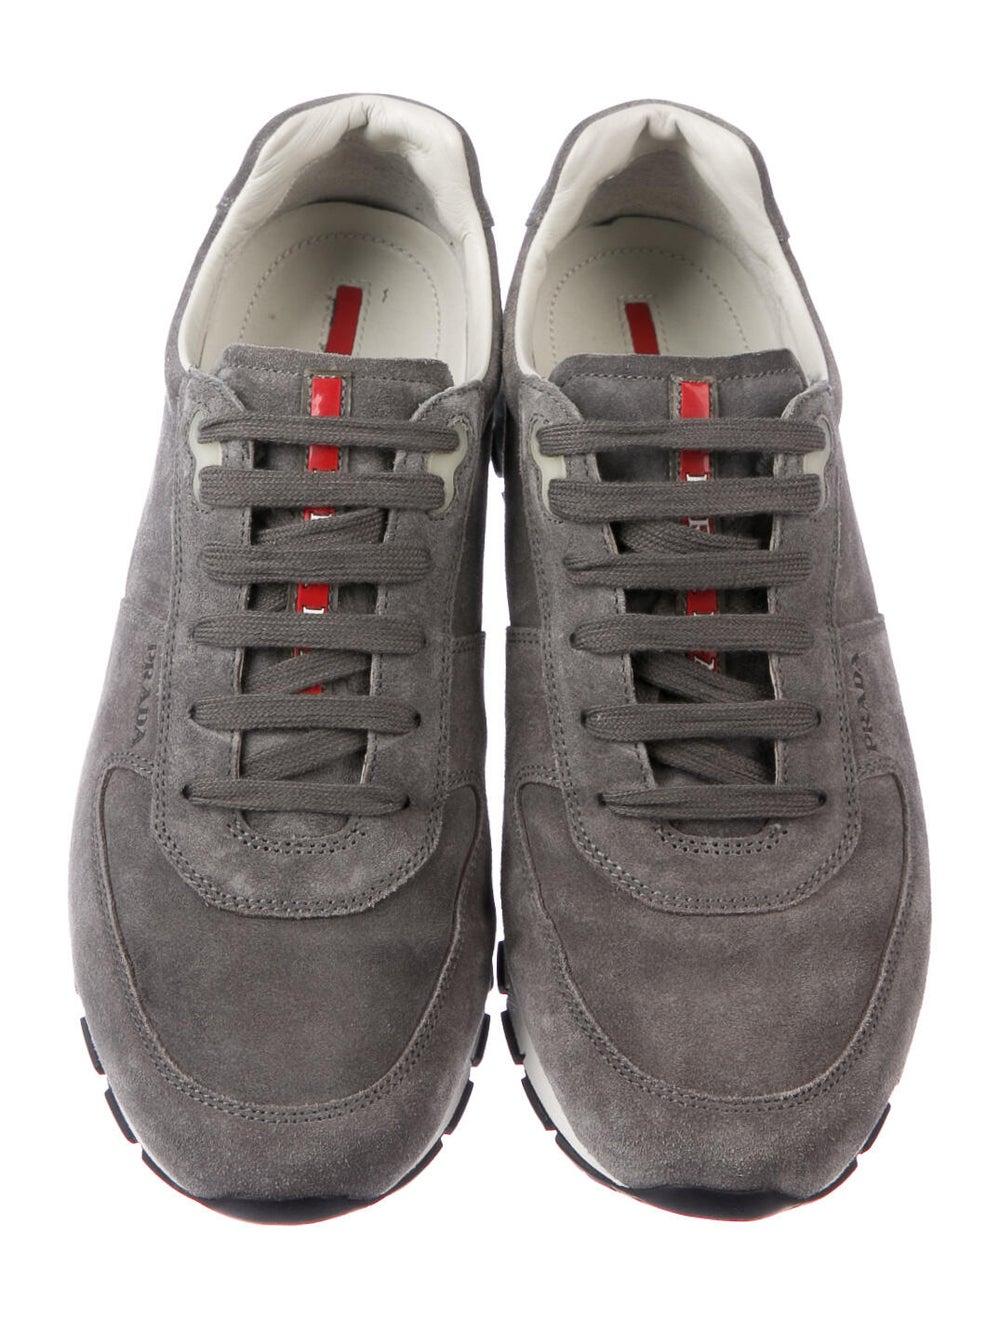 Prada Sport Suede Sneakers Grey - image 3